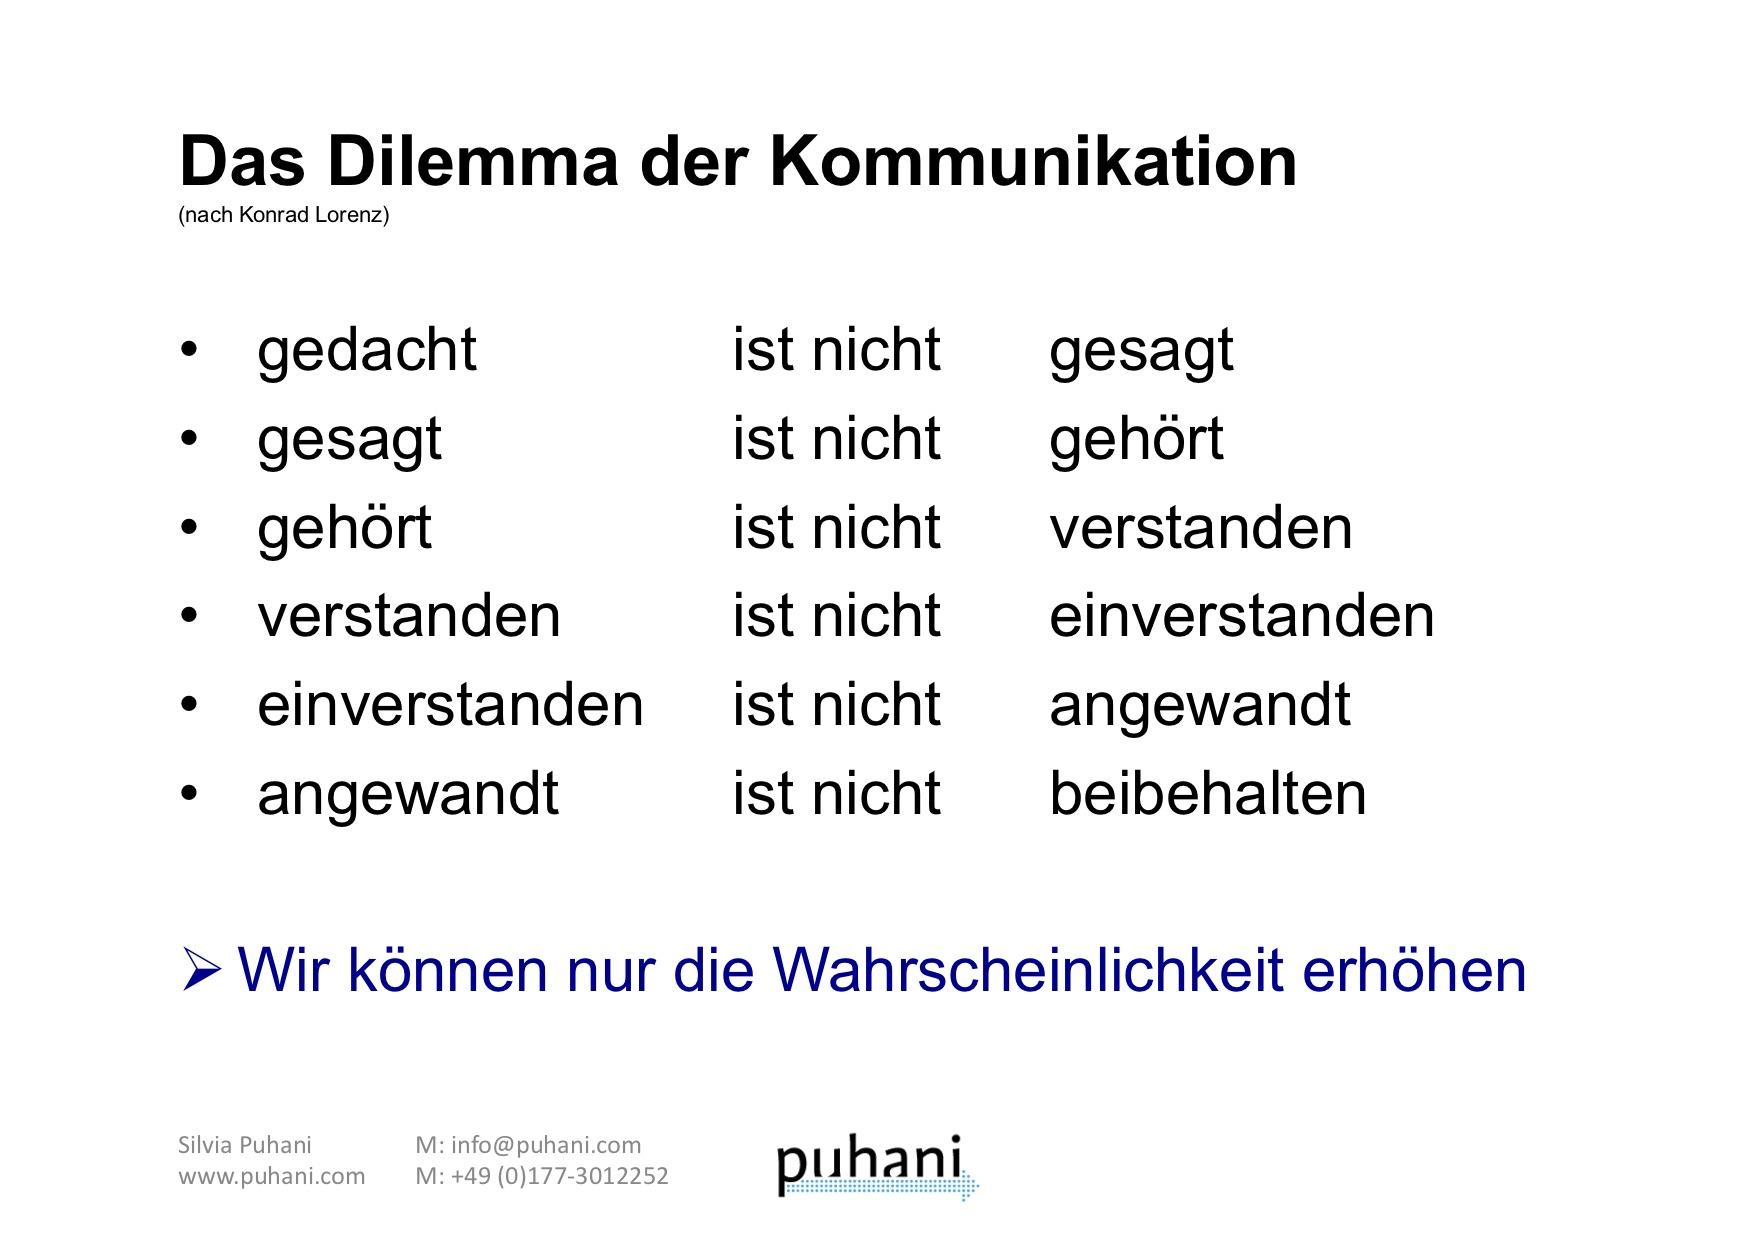 Das Dilemma Der Kommunikation Nach Konrad Lorenz Puhani